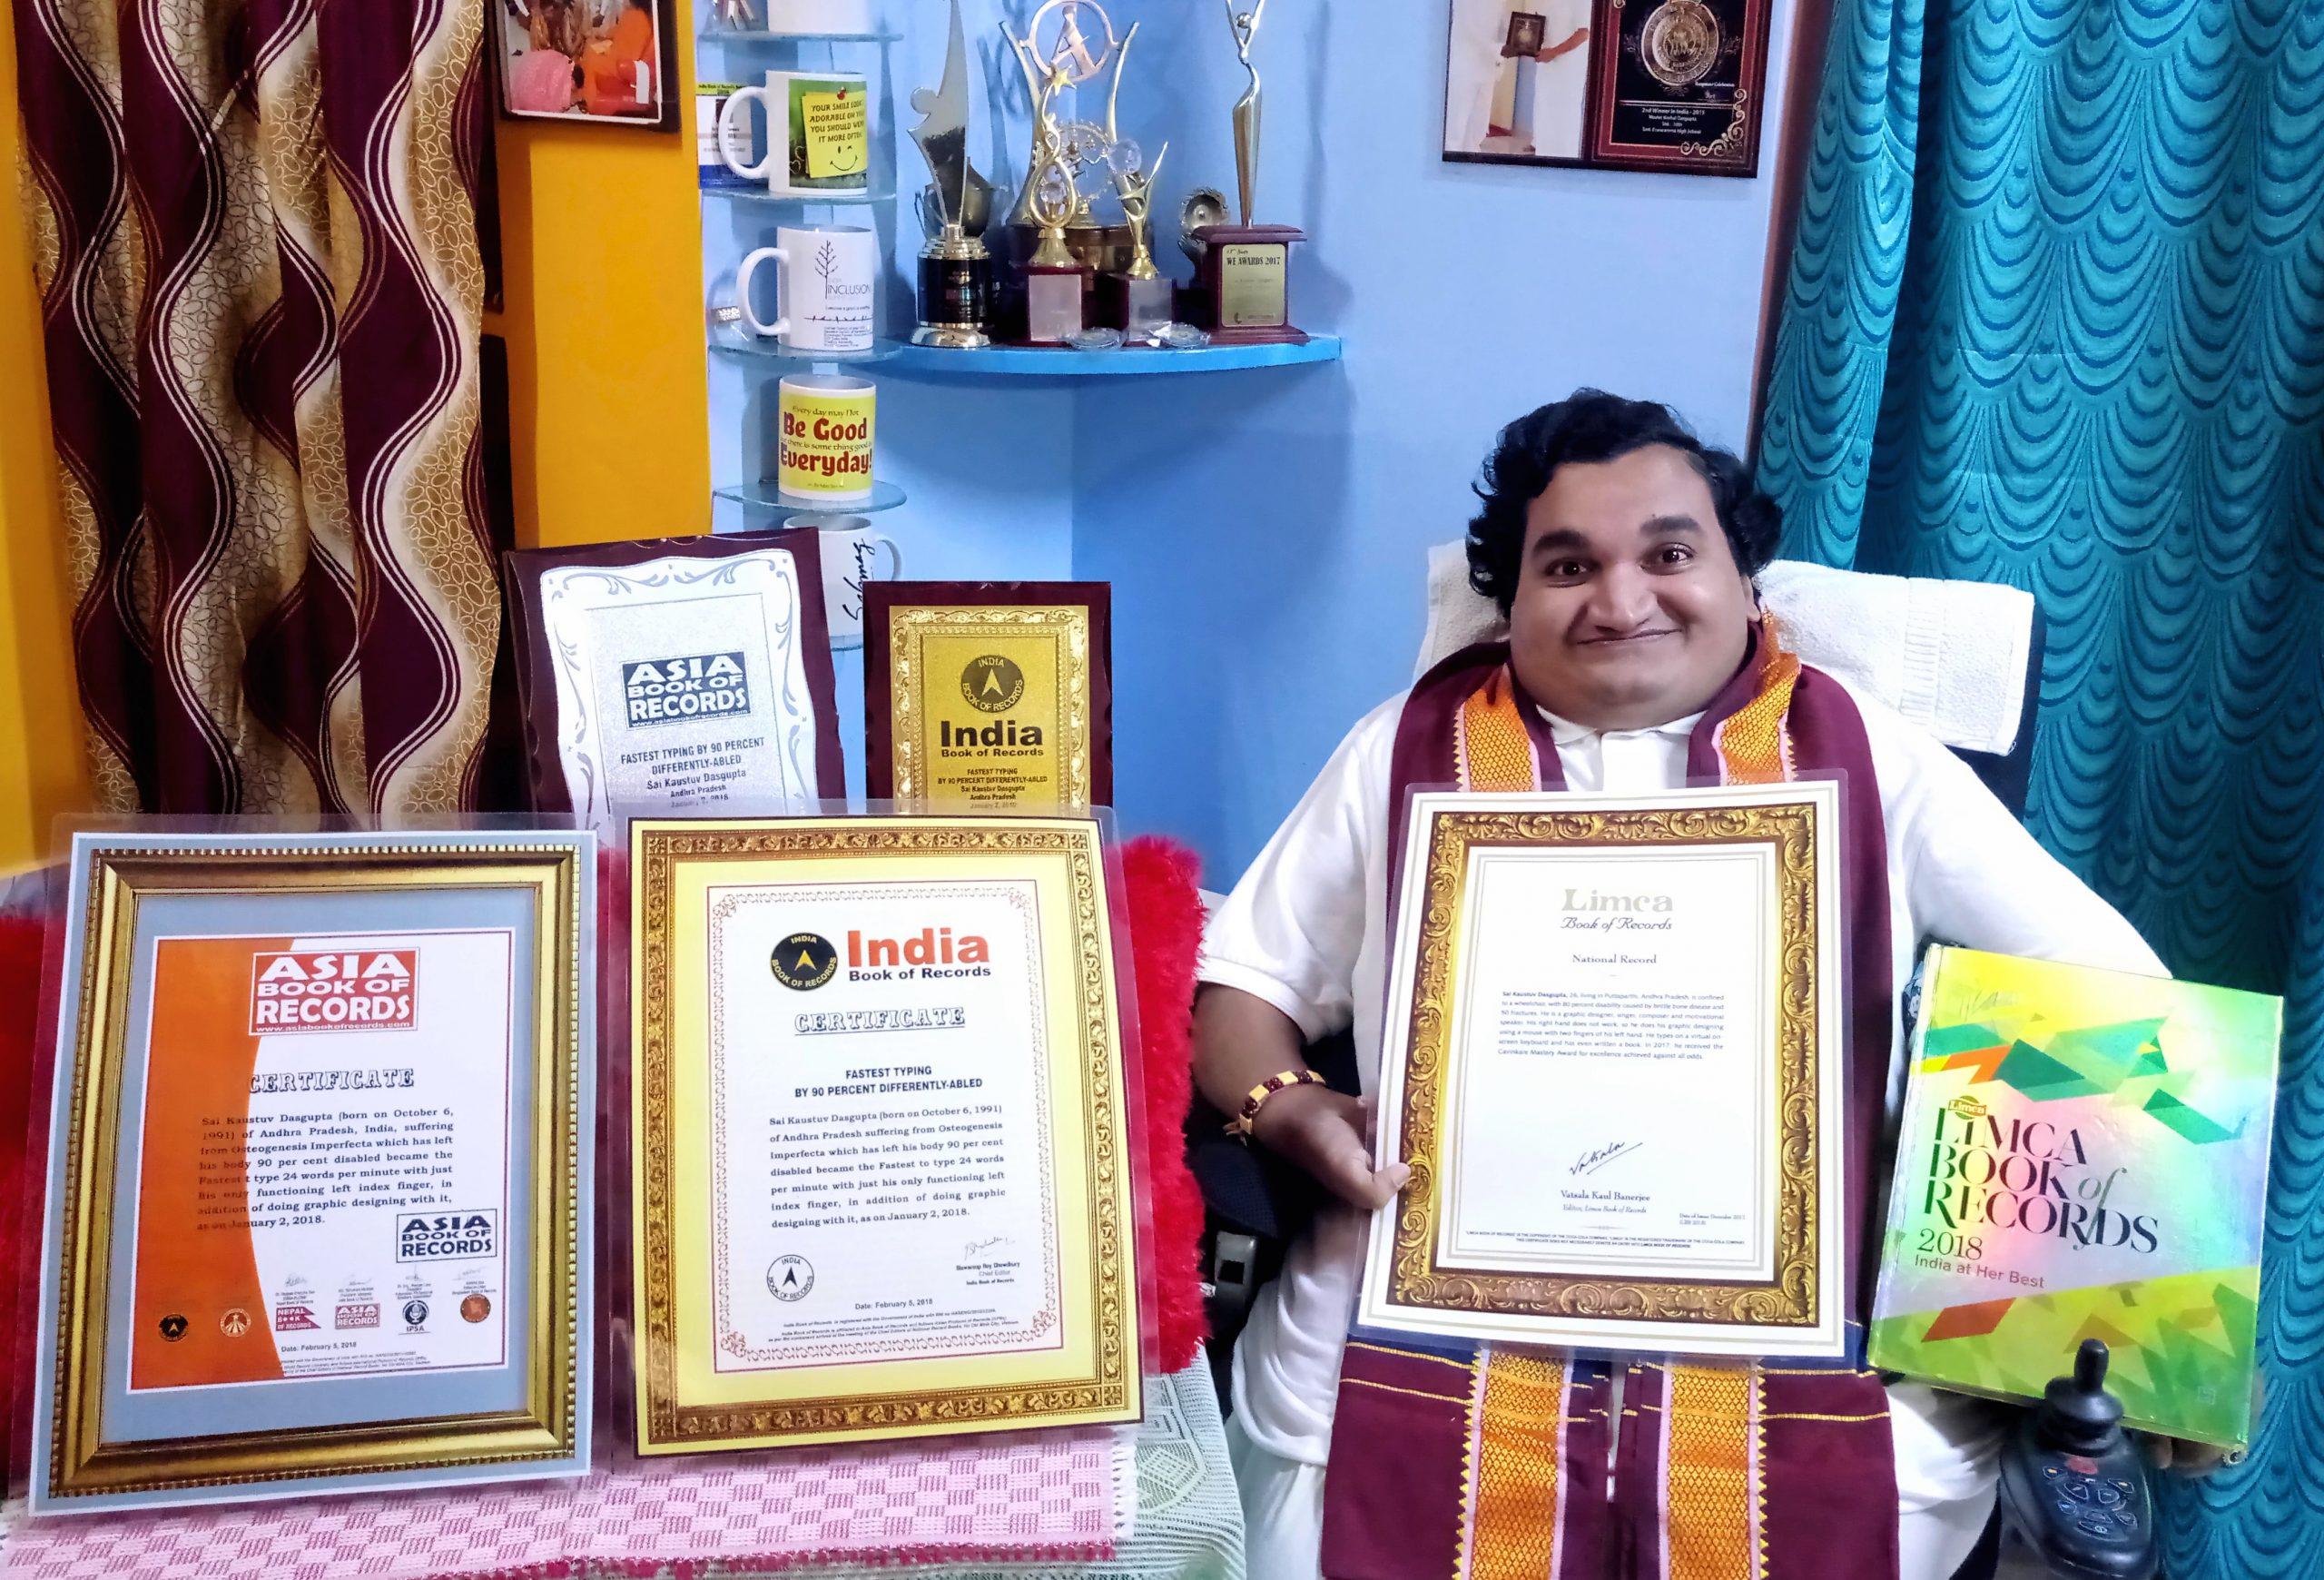 Dr. Sai Kaustuv Dasgupta